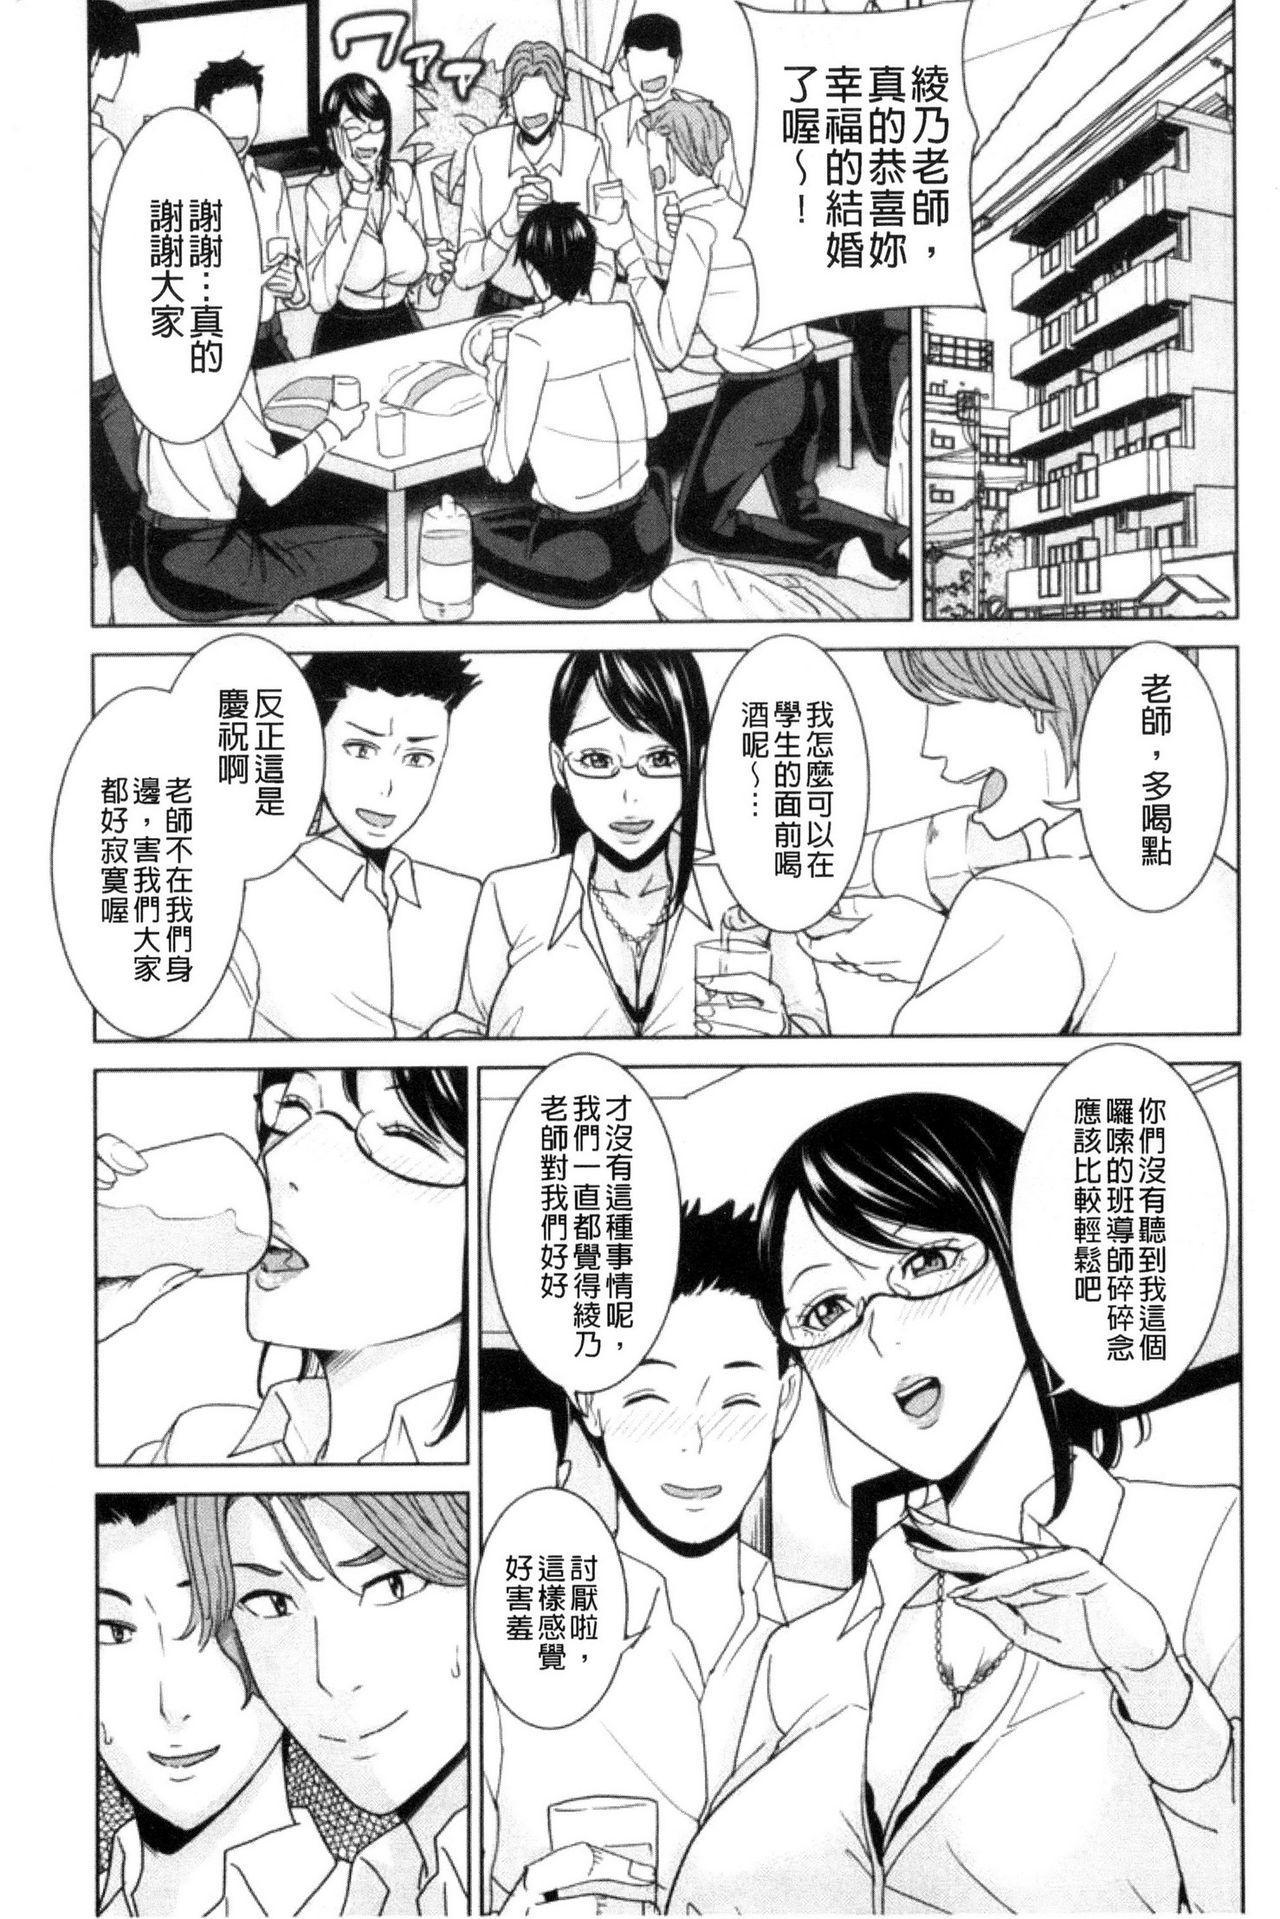 Aniyome Bitch Life   兄嫂淫蕩女性生活 123